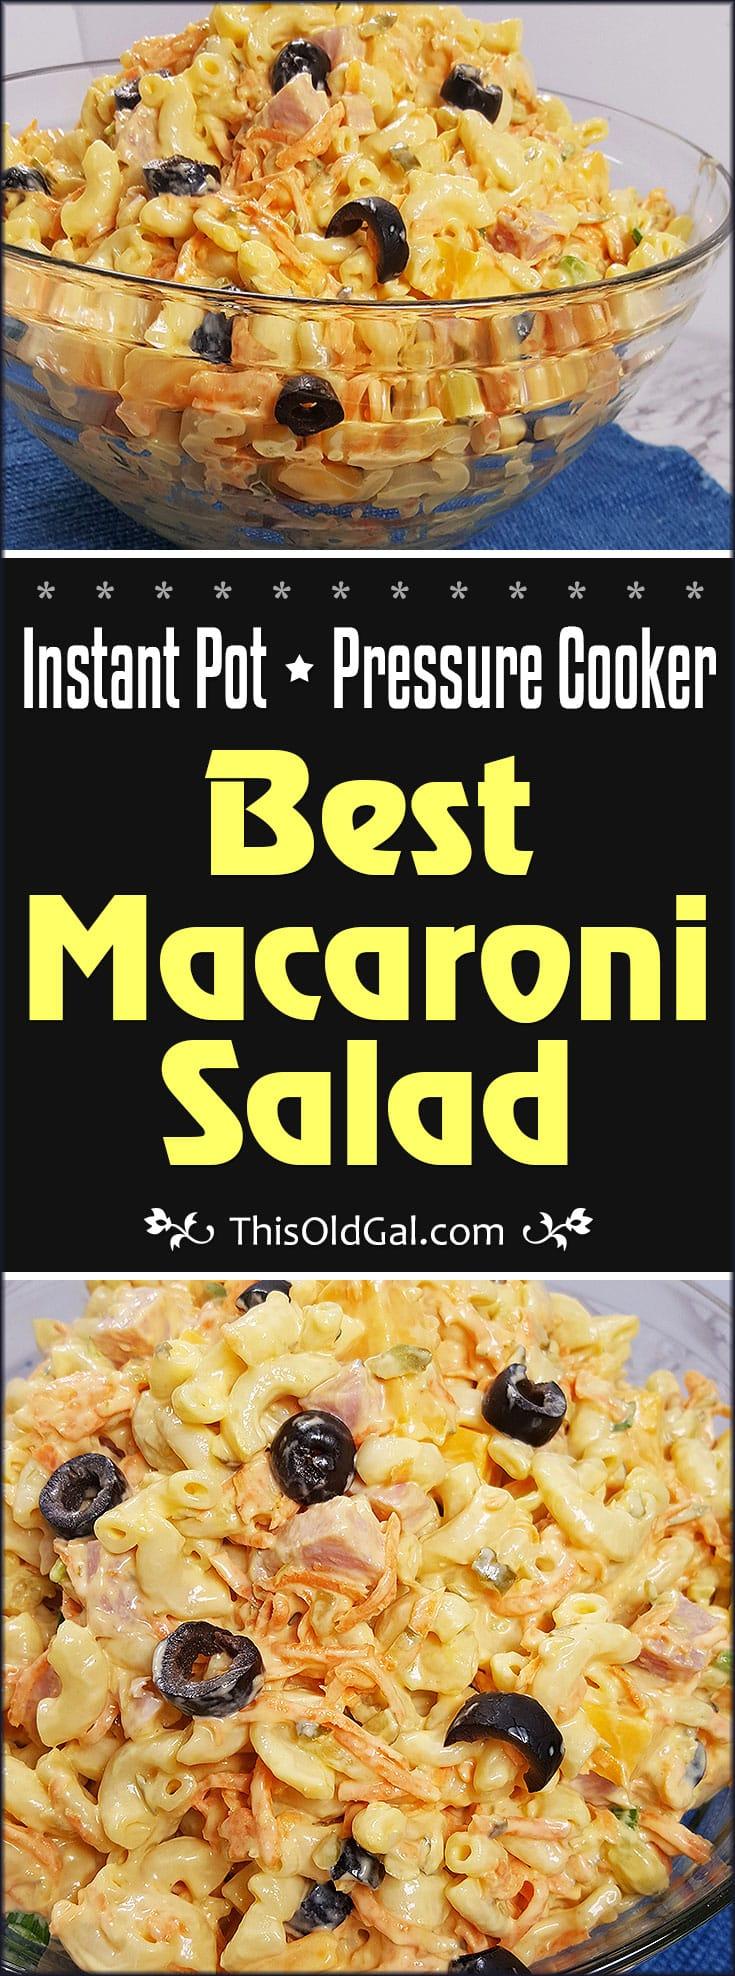 Pressure Cooker Best Macaroni Salad Recipe